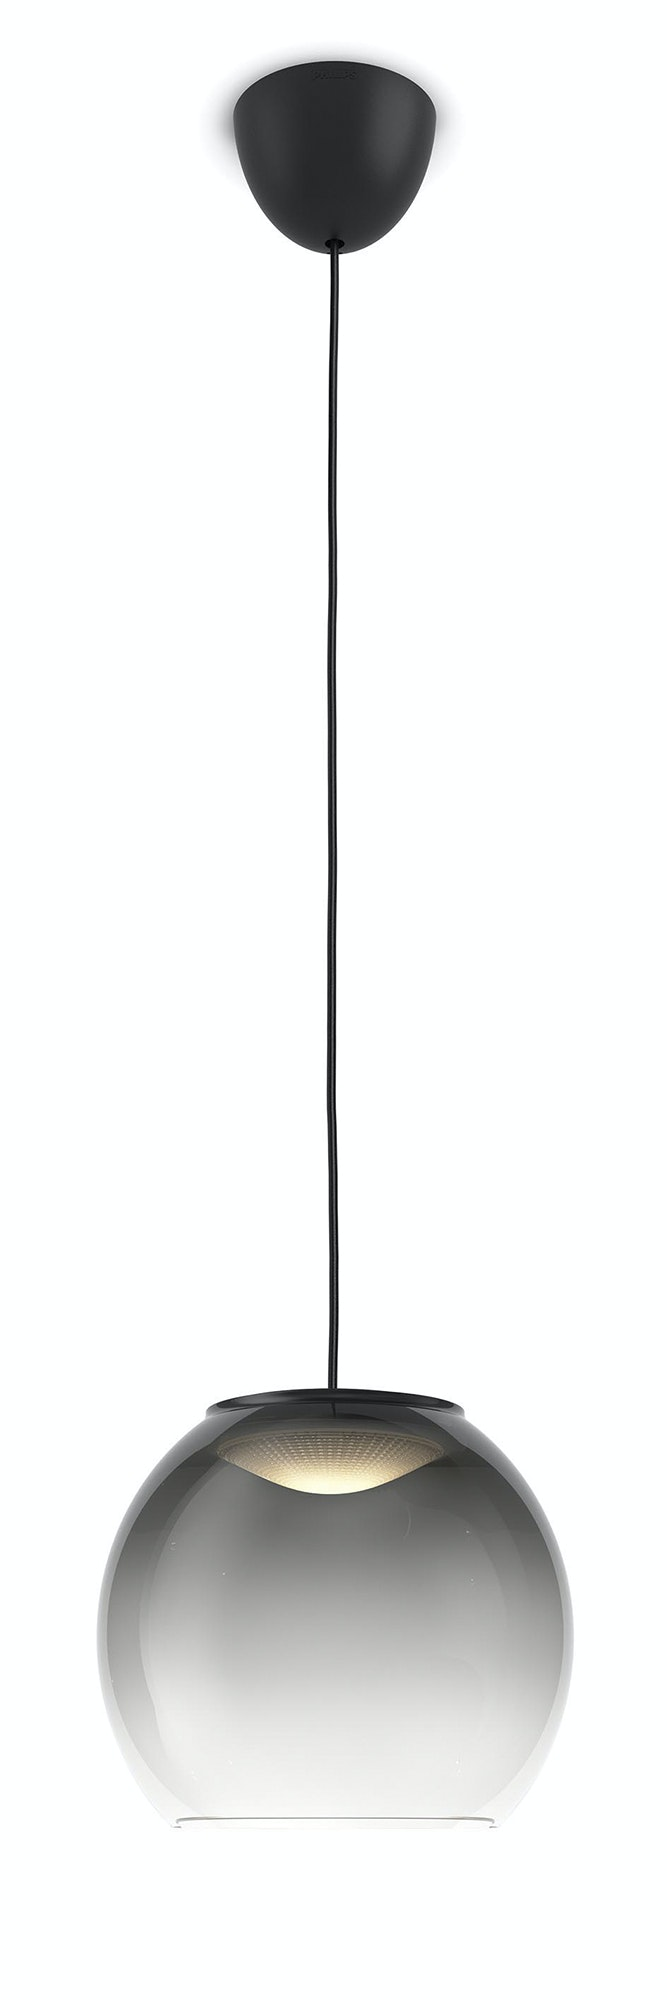 Pendel Philips Vienne grå 1x4.5W 230V